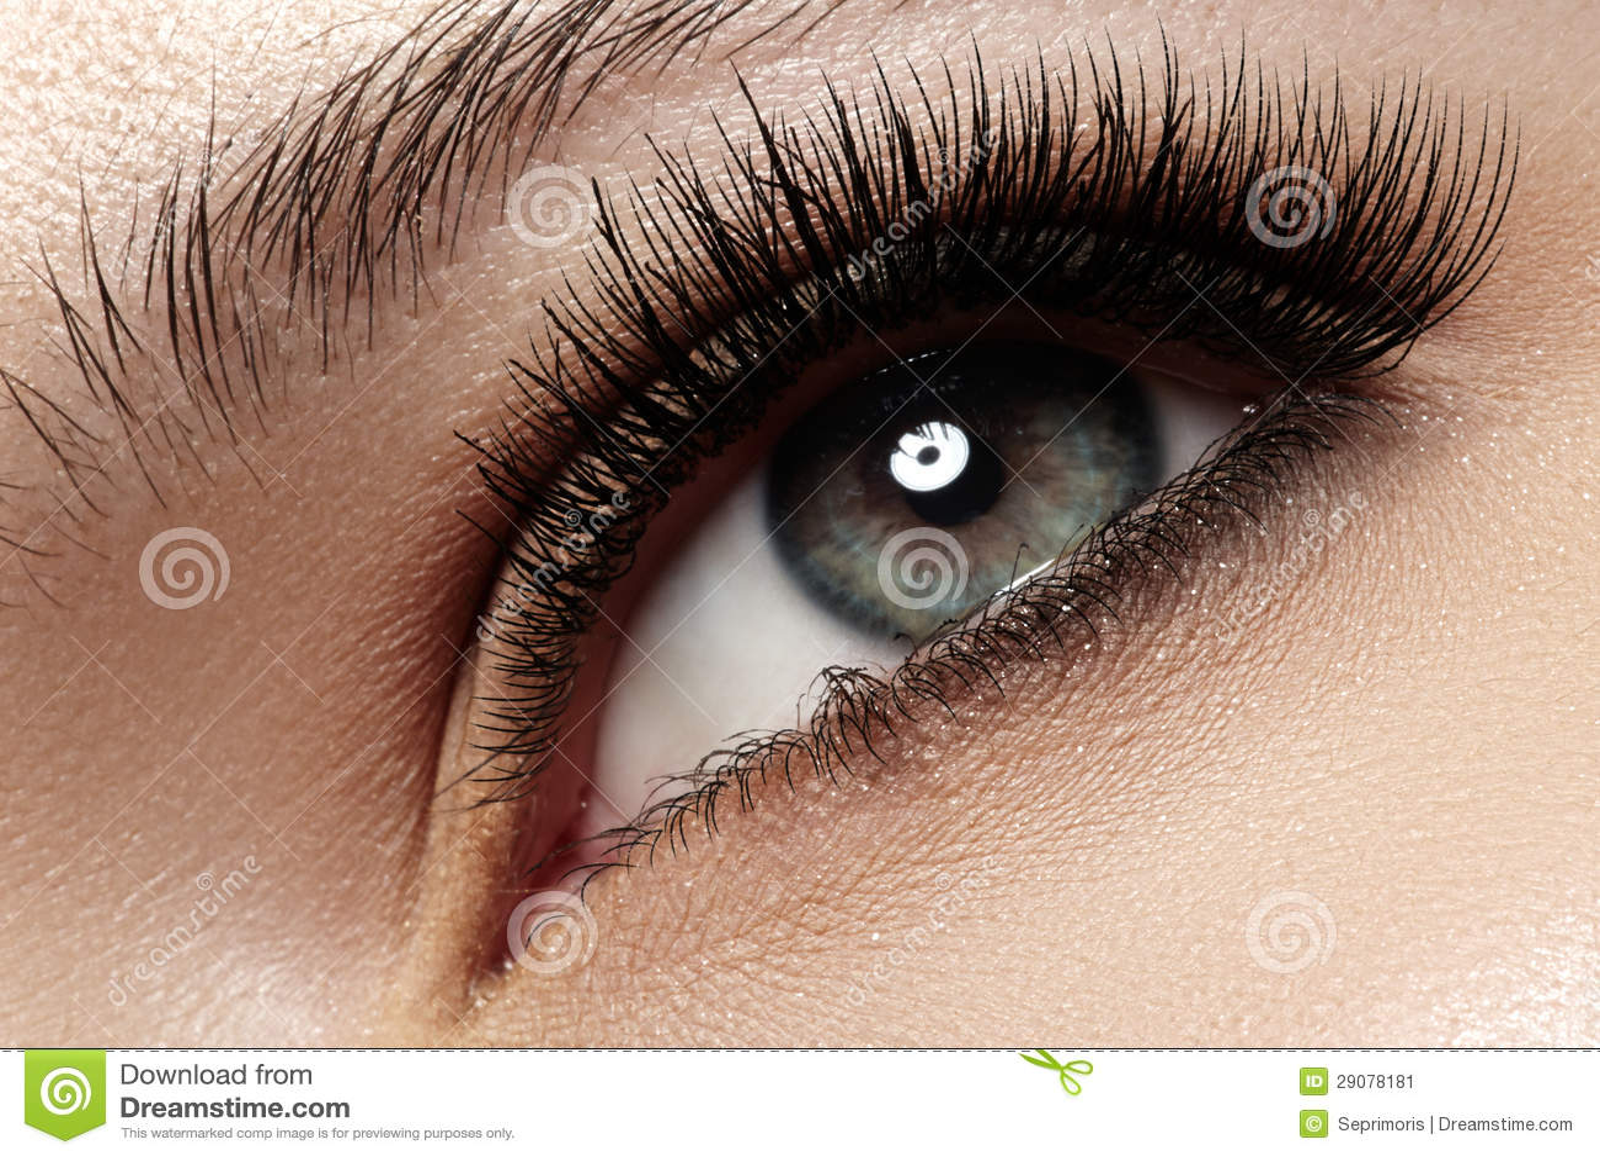 Close-up eye with fashion light natural make-up, extra long and volume eyelashes